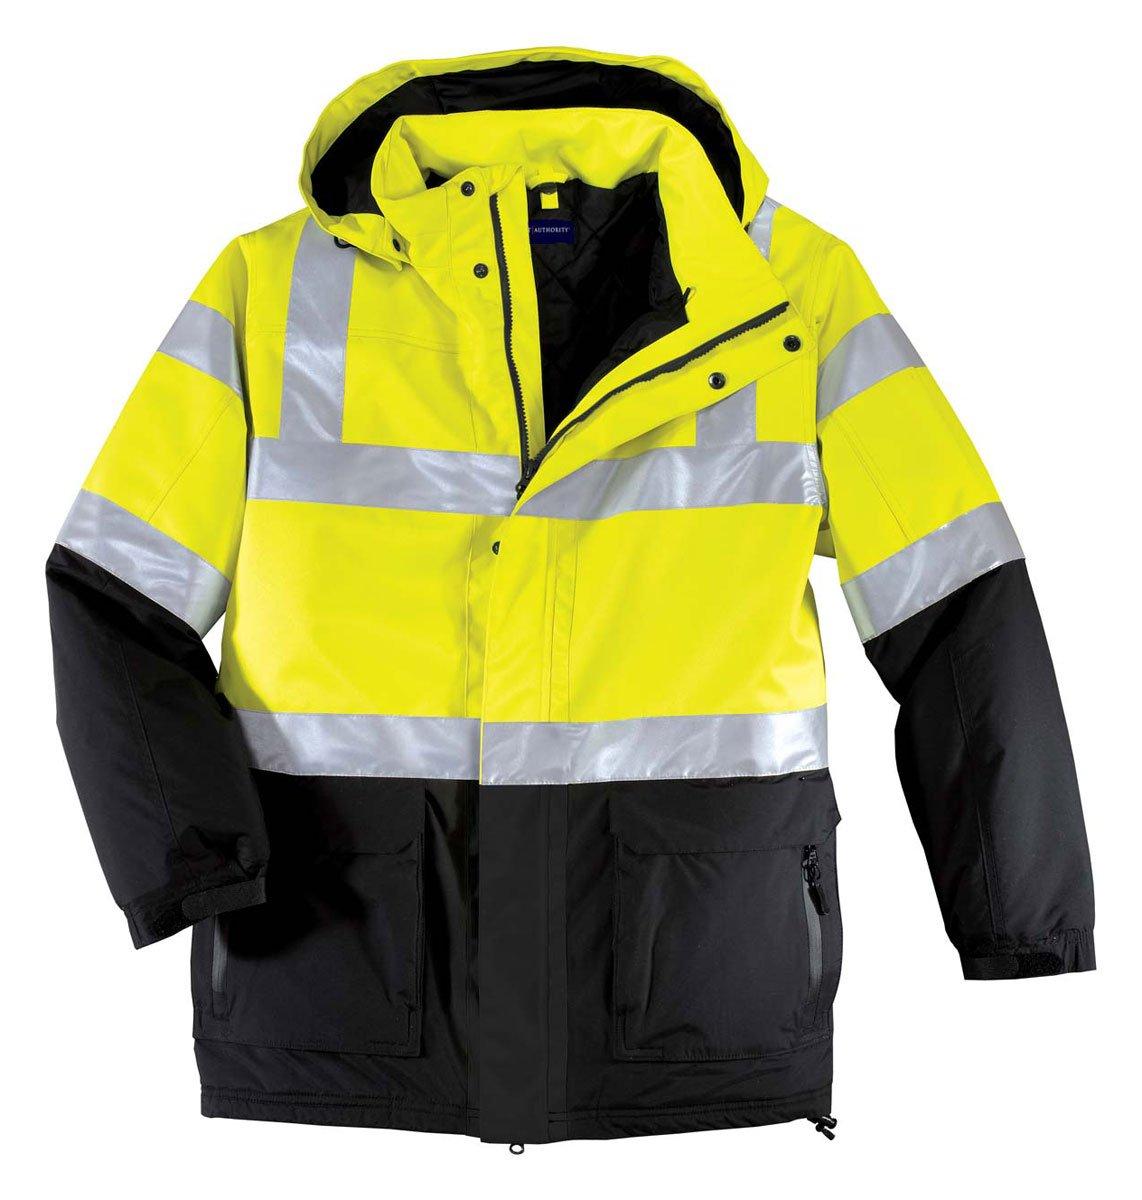 Port Authority Men's Safety Parka_Safety Yellow/ Black/Reflective_M